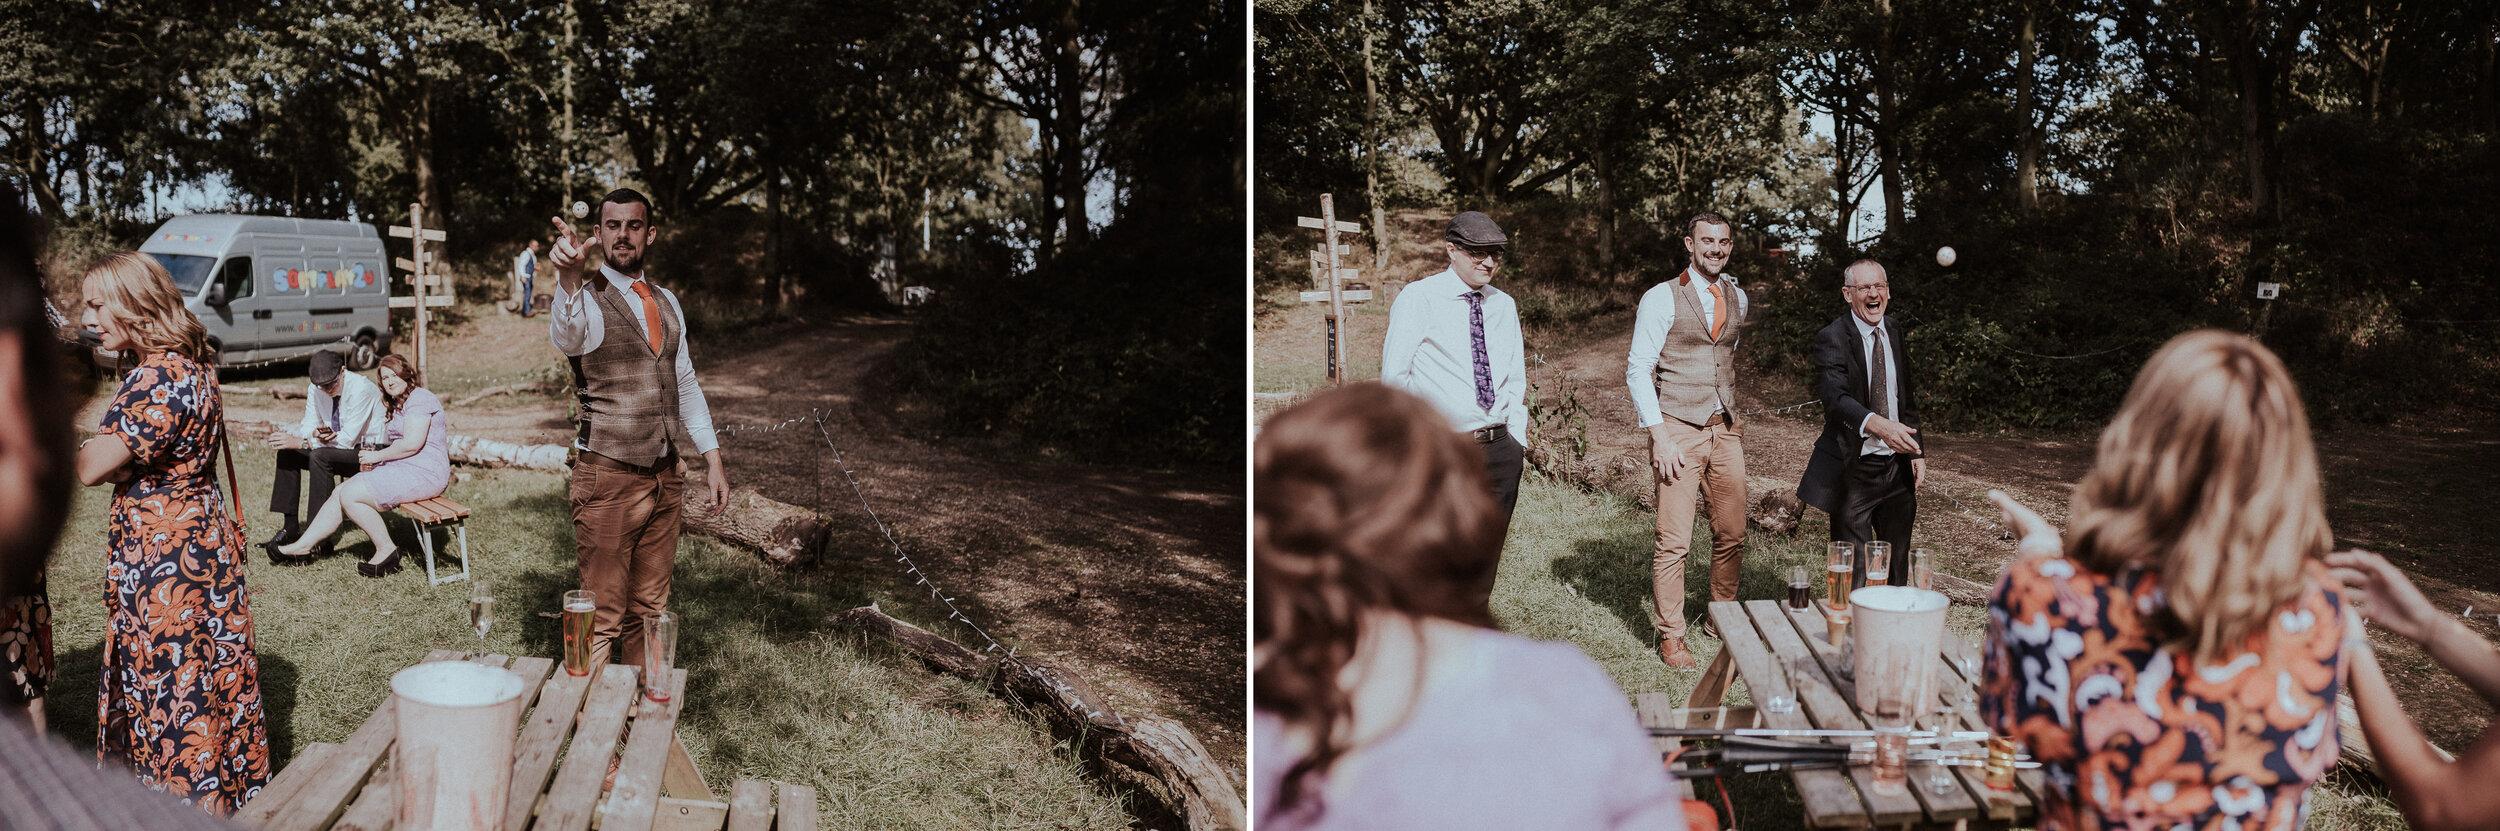 Norfolk_Alternative_Wedding_Photographer-67 copy.jpg